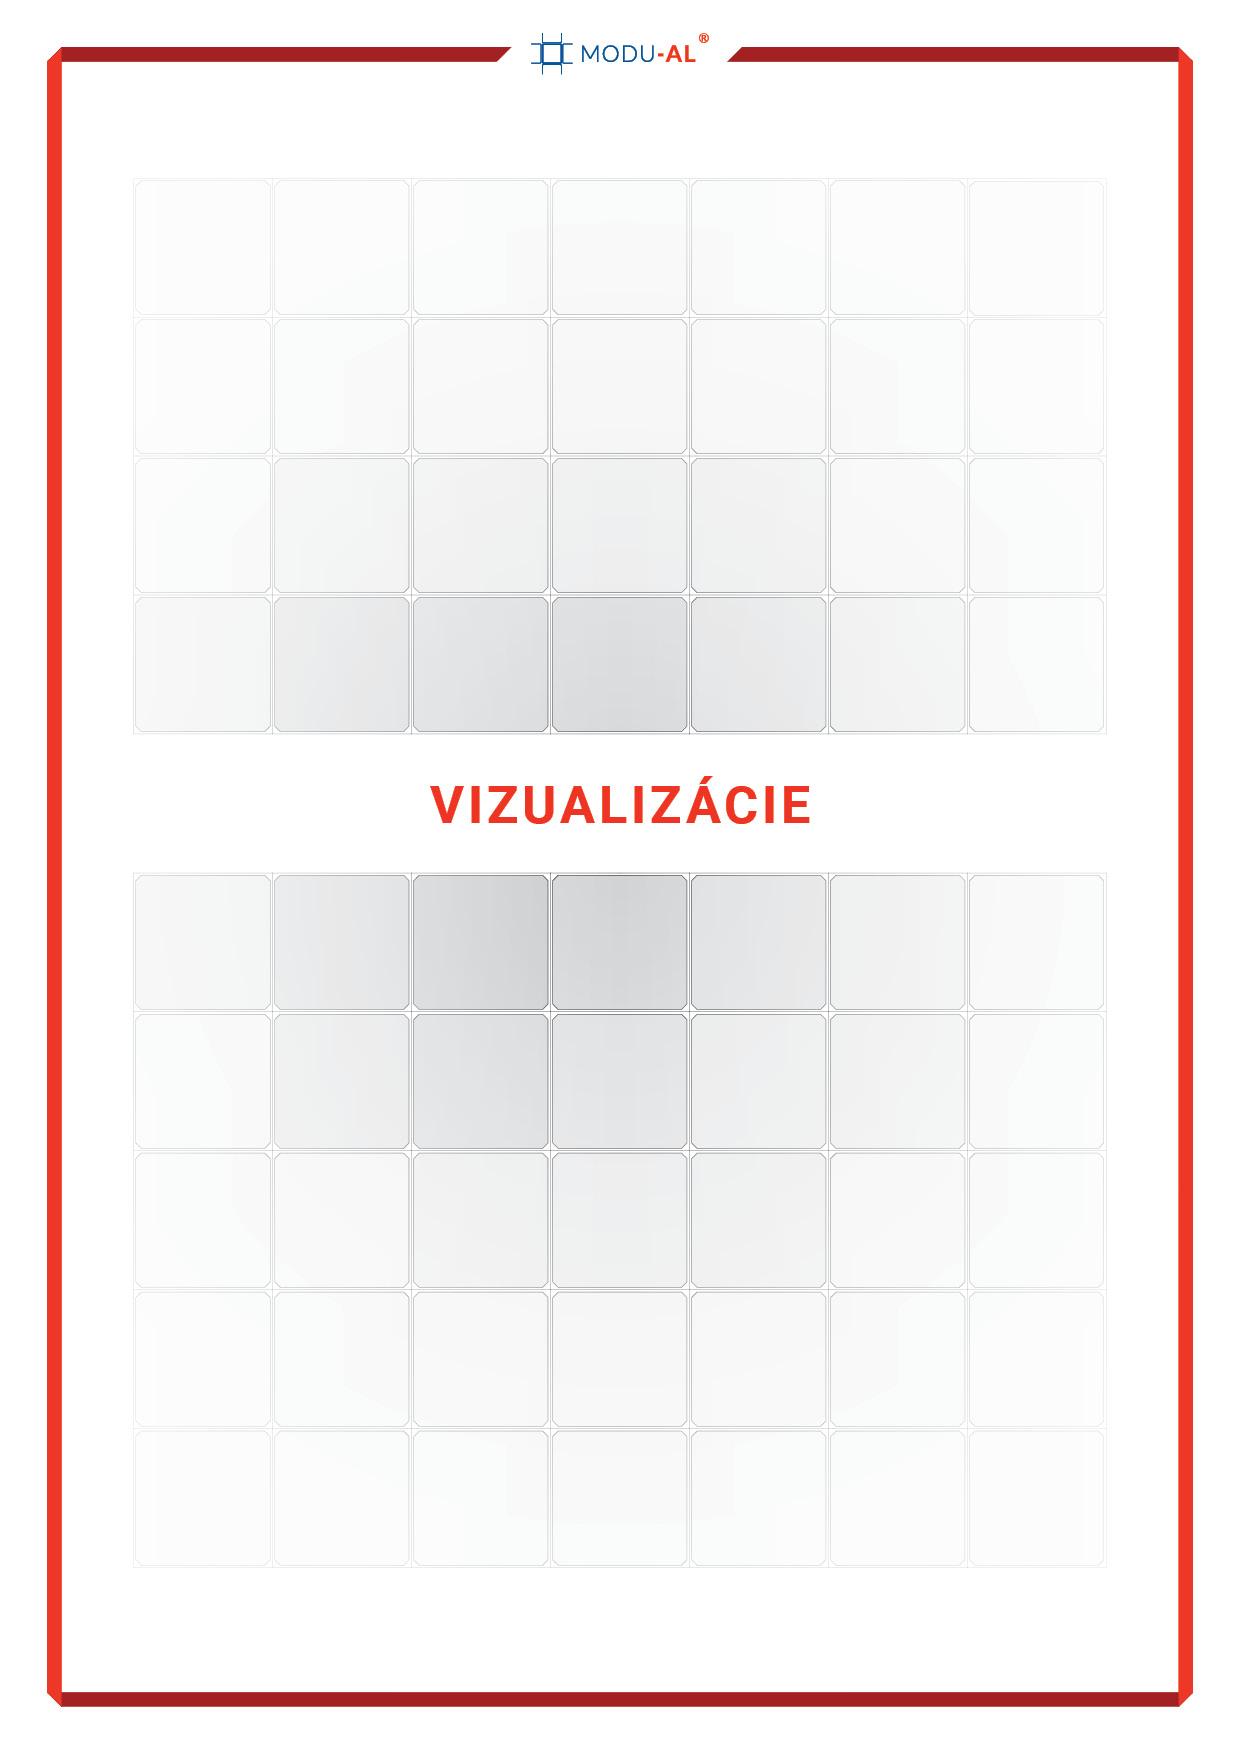 MODUAL_URNOVY SYSTEM_PONUKA_VIZUALIZACIE_ukazka